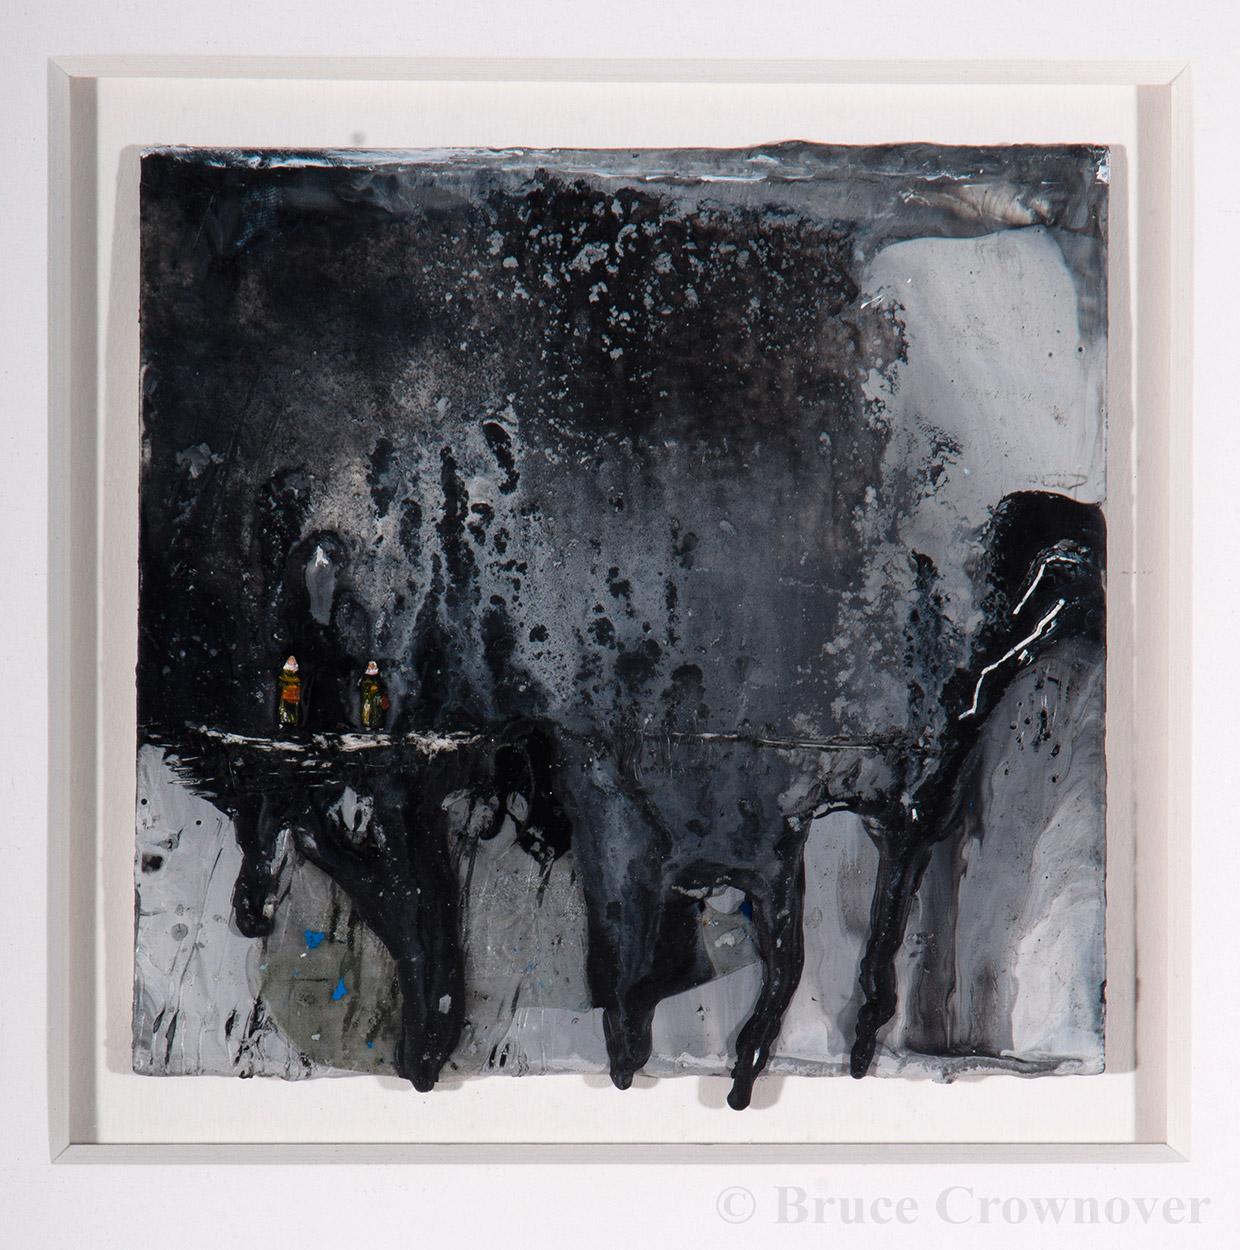 Bruce Crownover - 'Nuns'